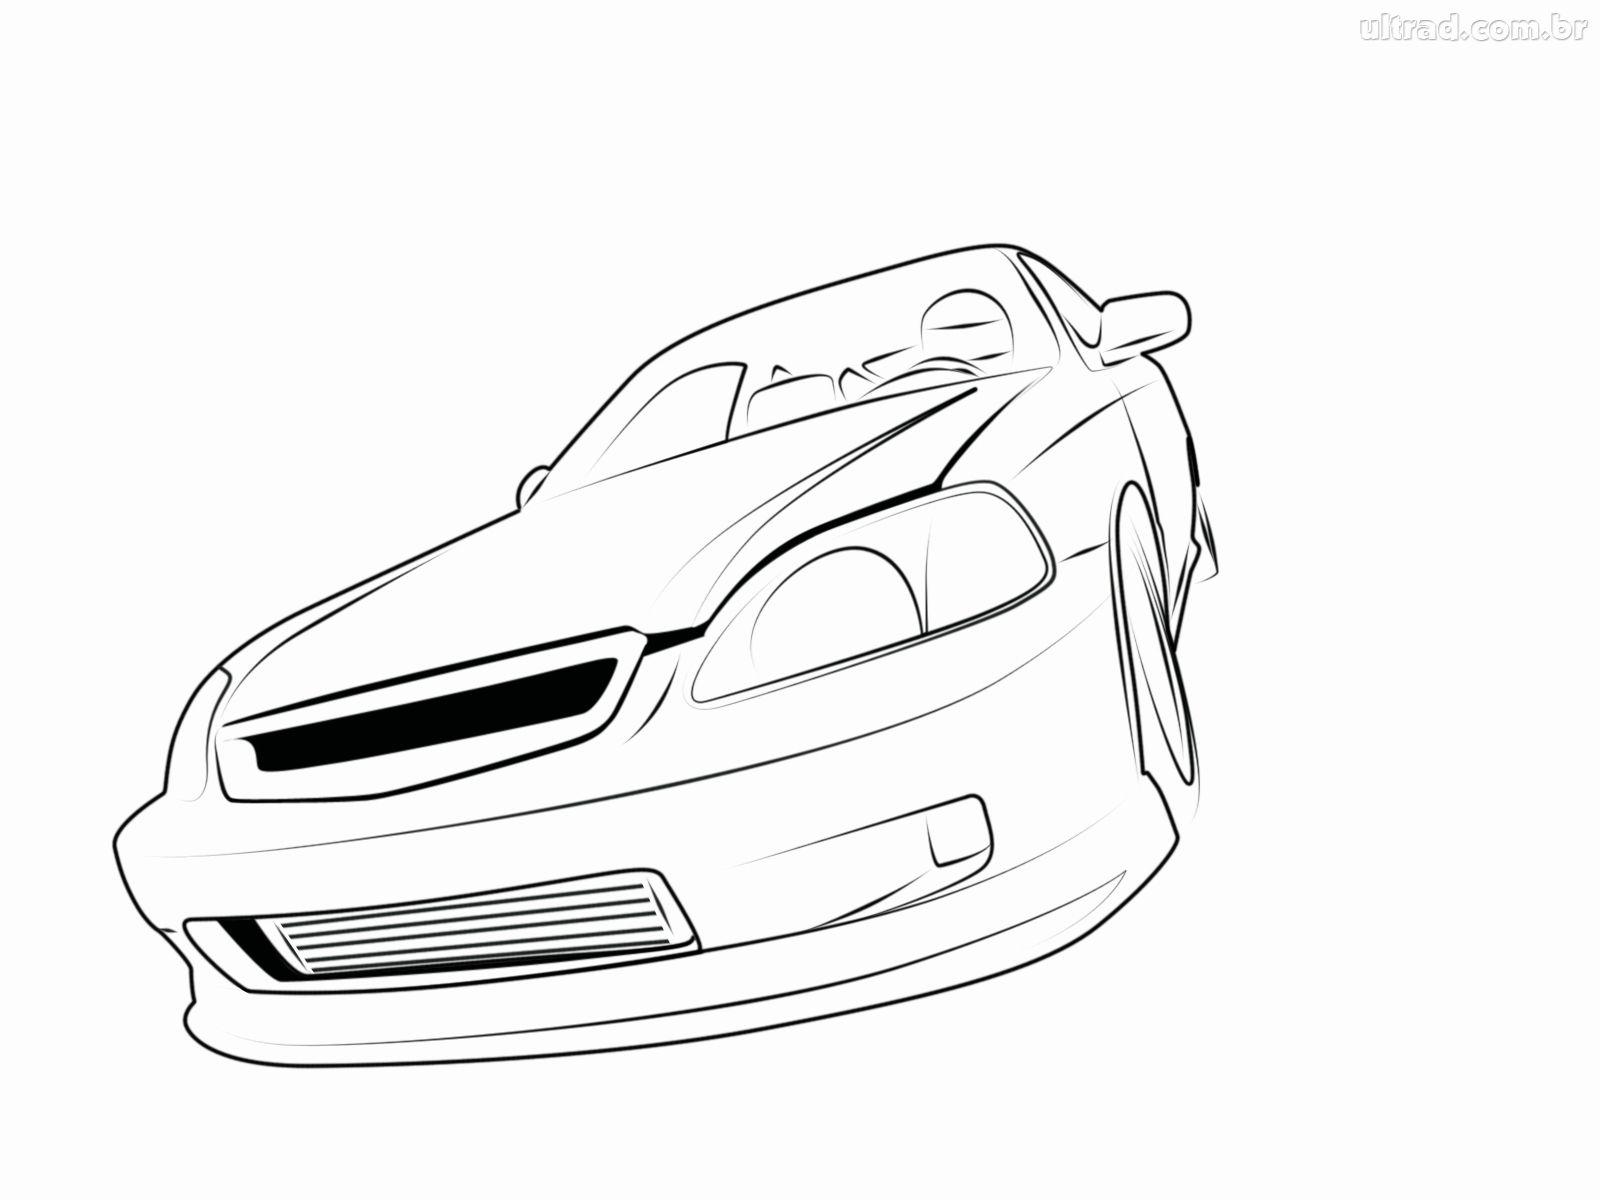 honda drawing at getdrawings com